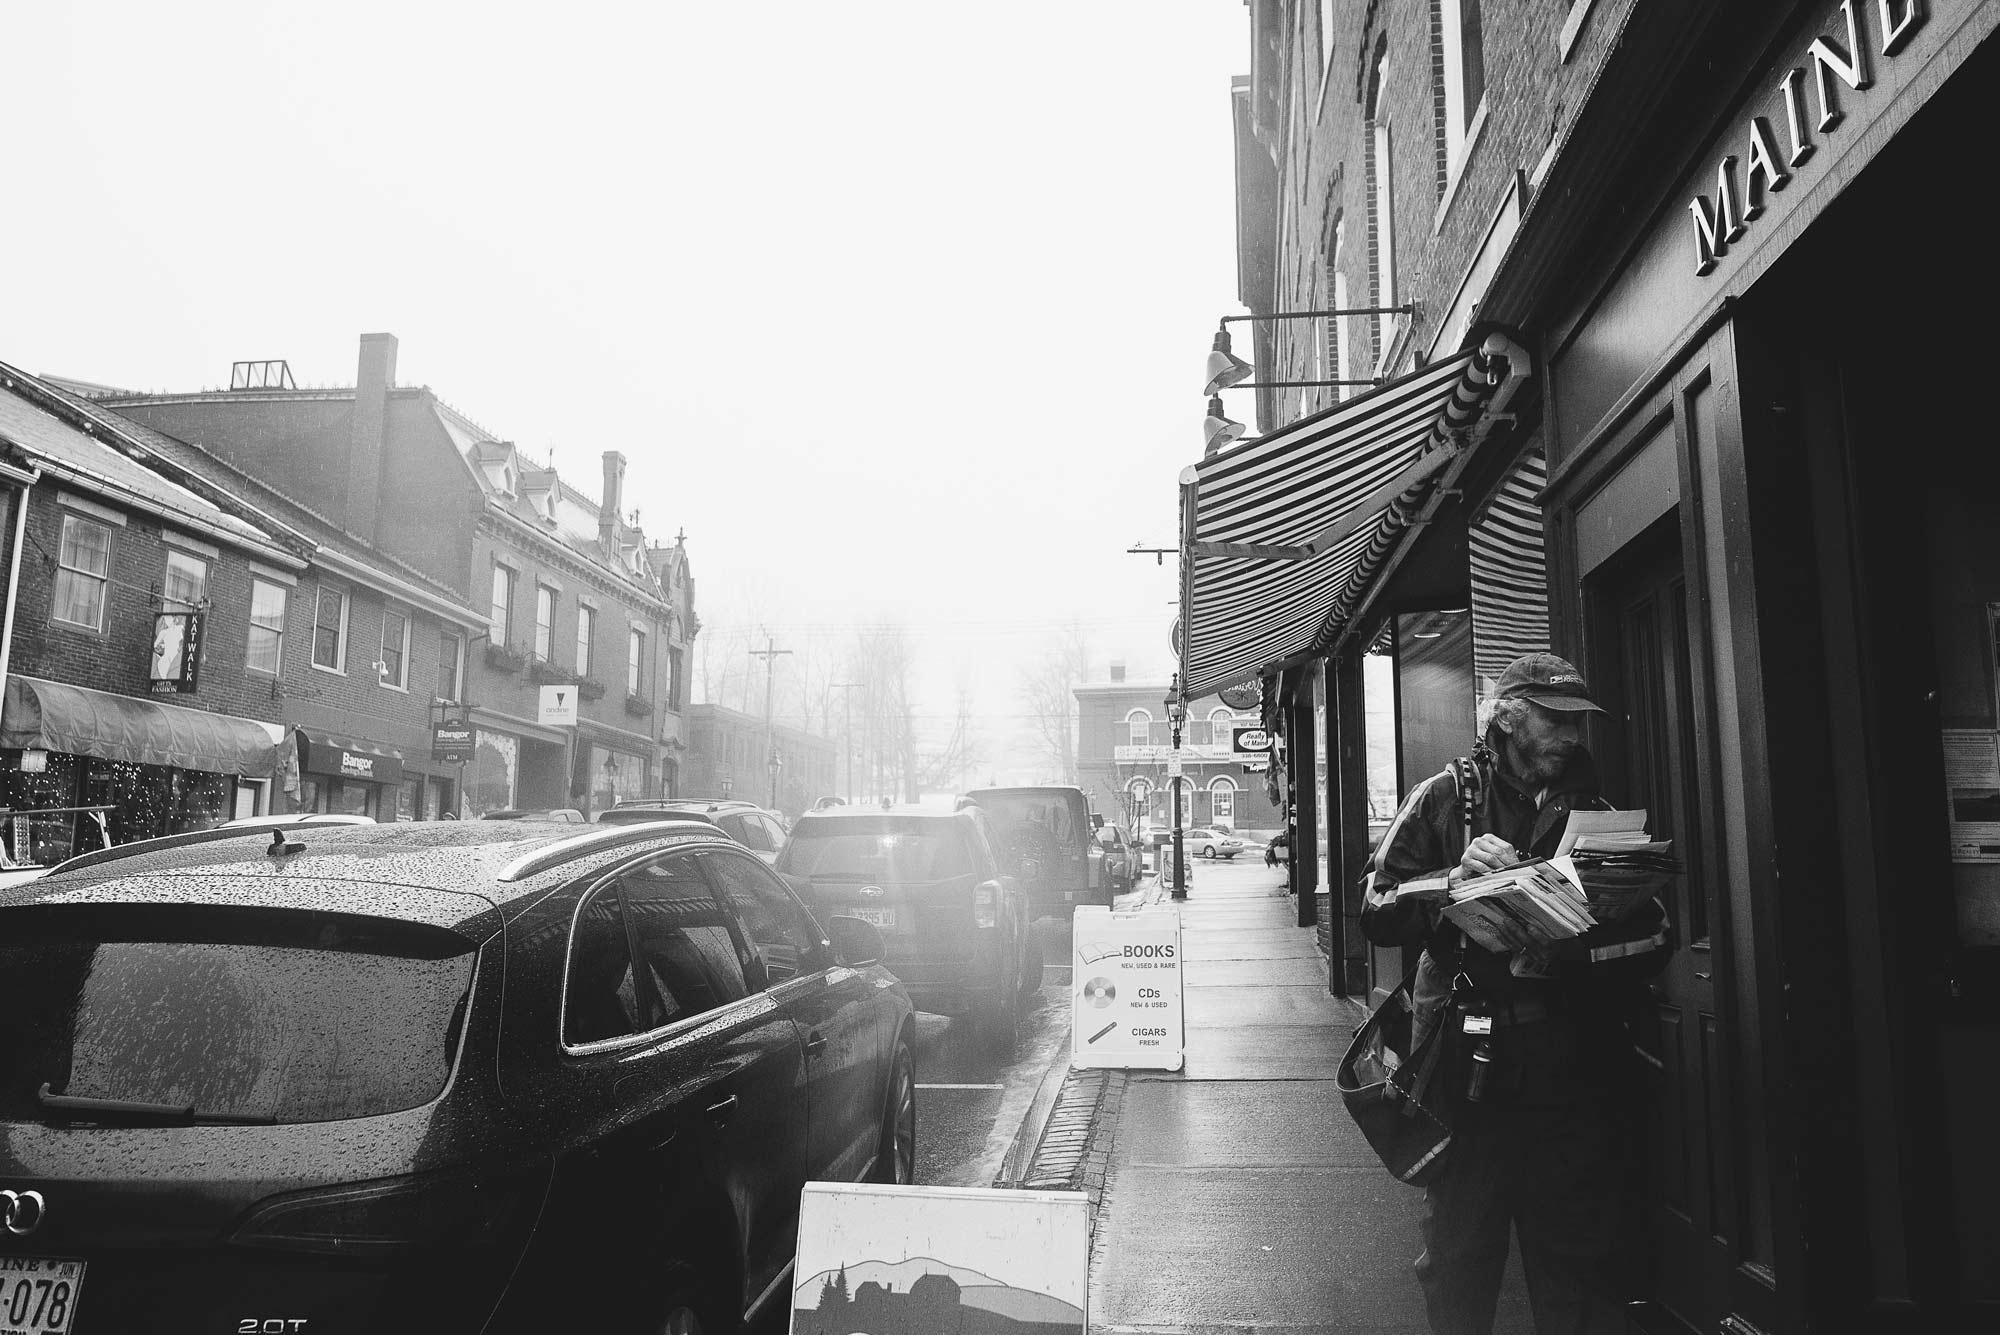 Main Street, Belfast, under the awning of Old Professor's Bookshop.